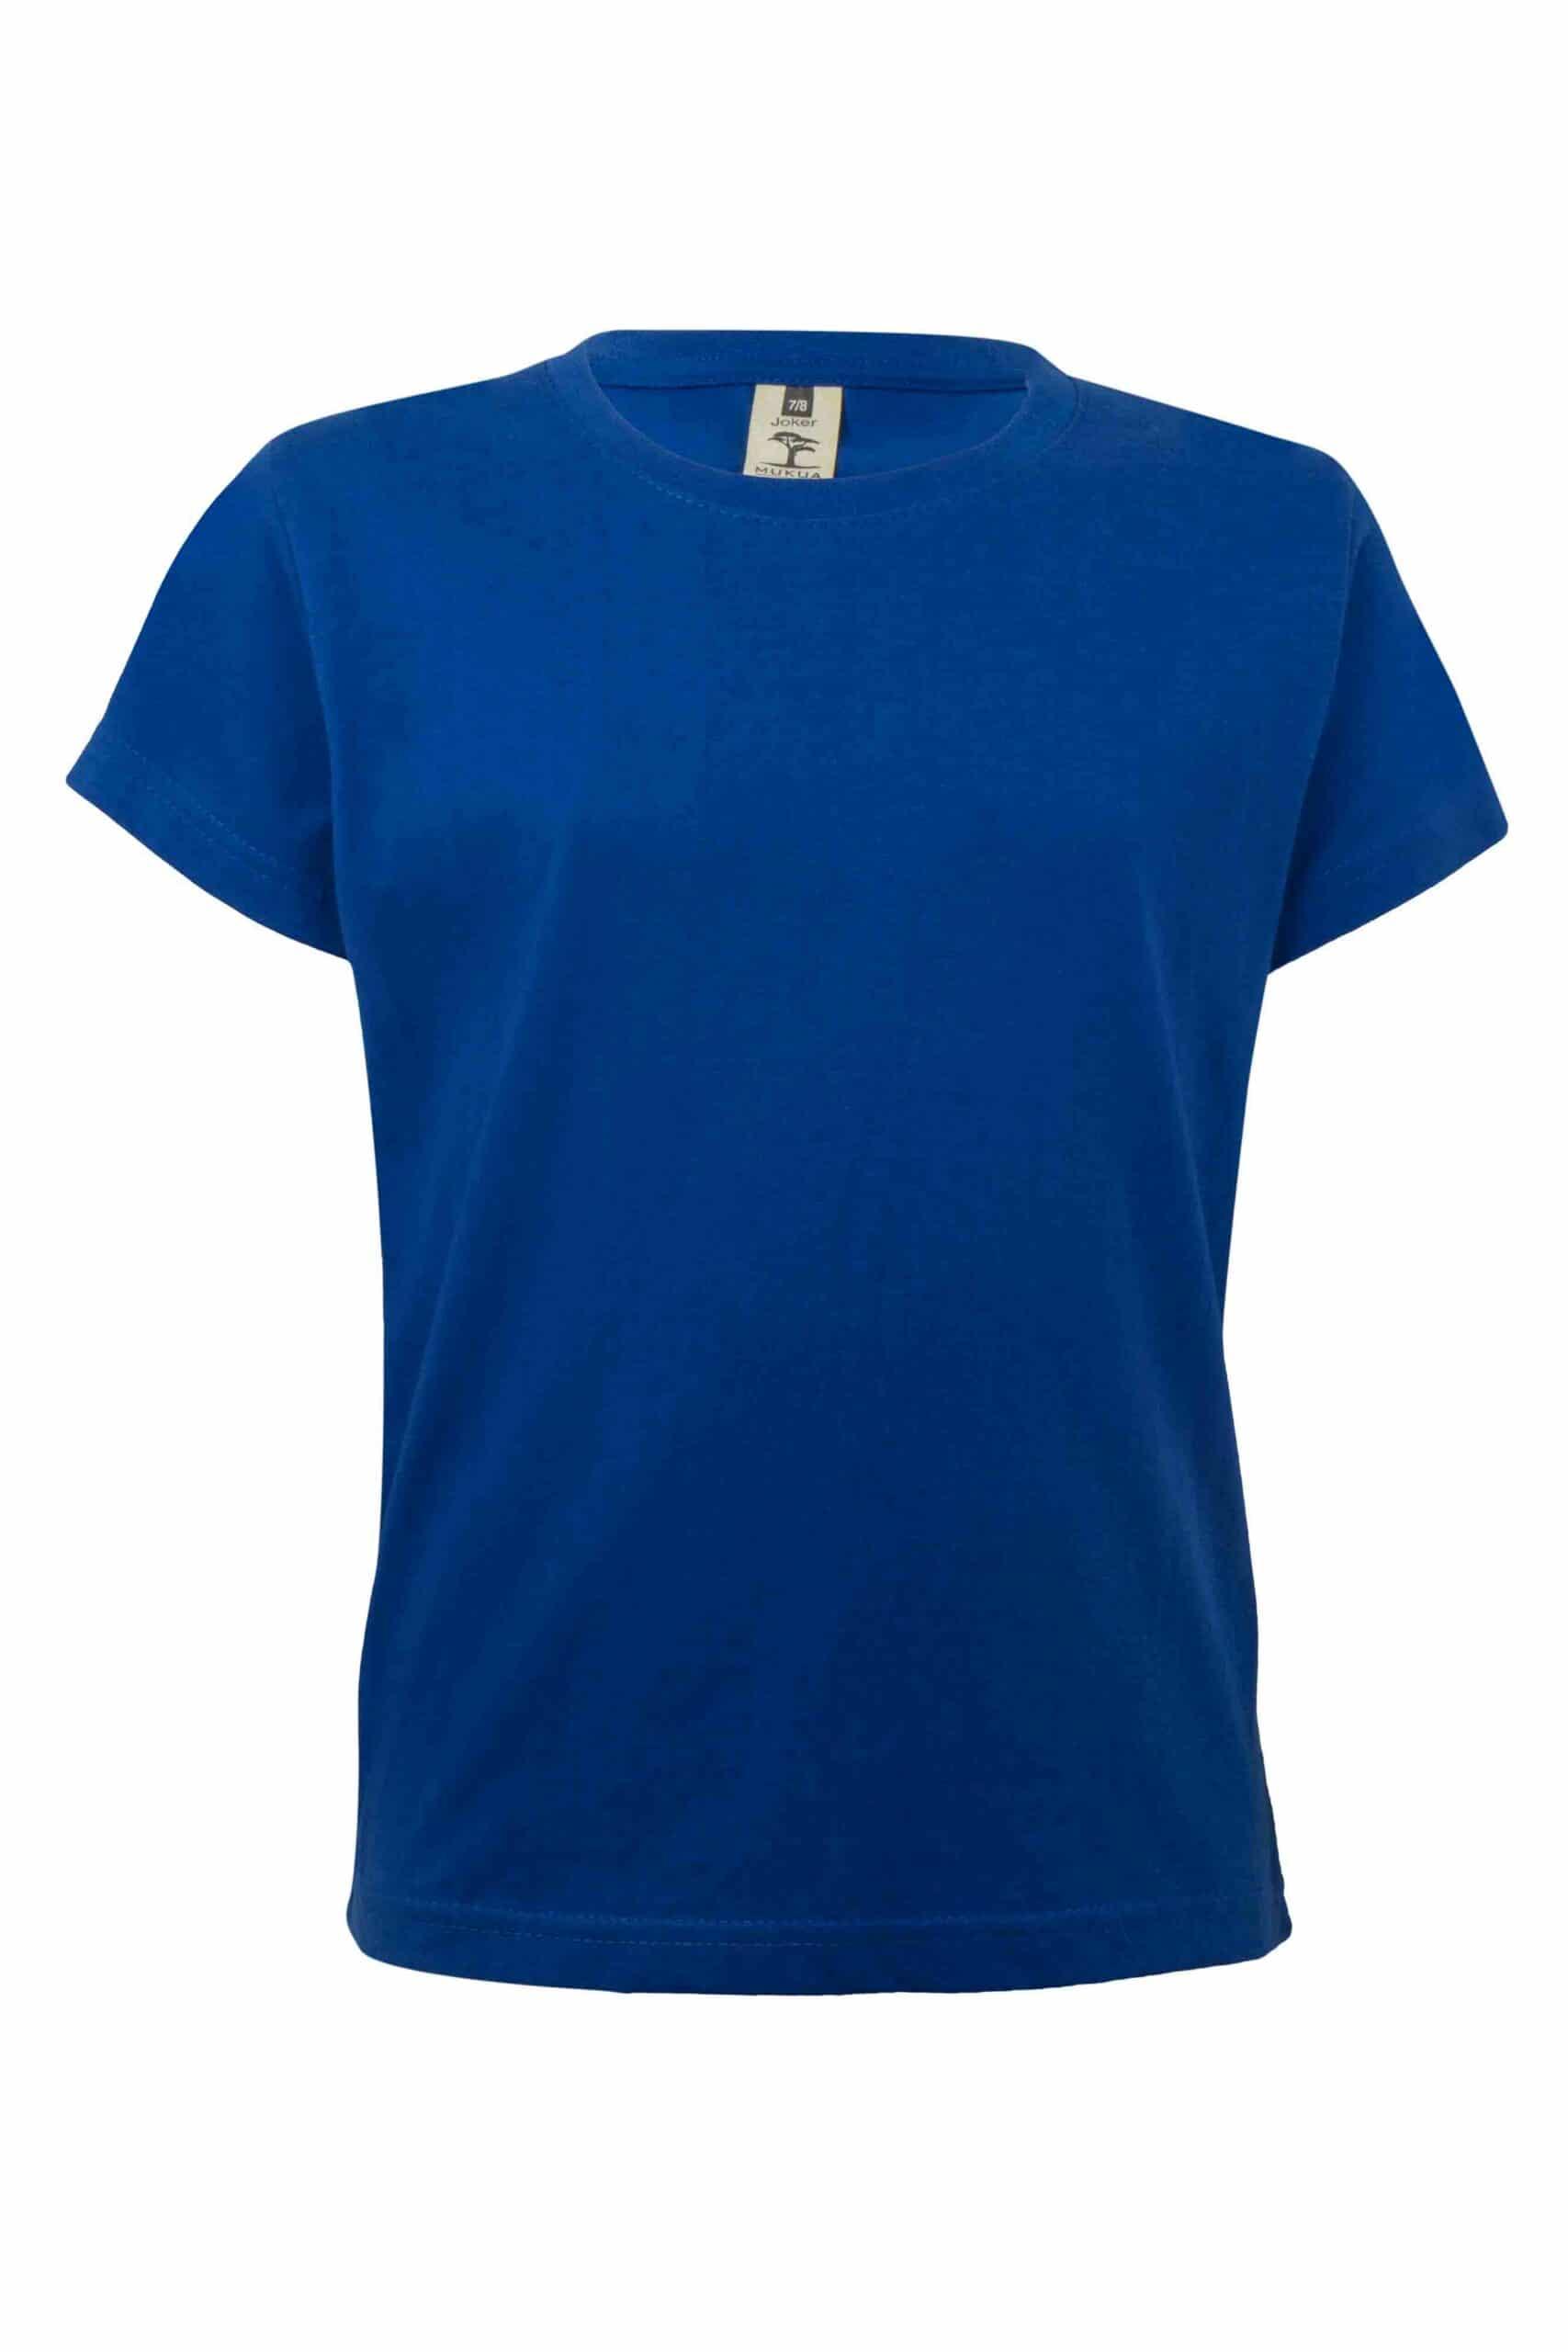 Mukua Mk175cv Camiseta Manga Corta NiÑo Royal Blue